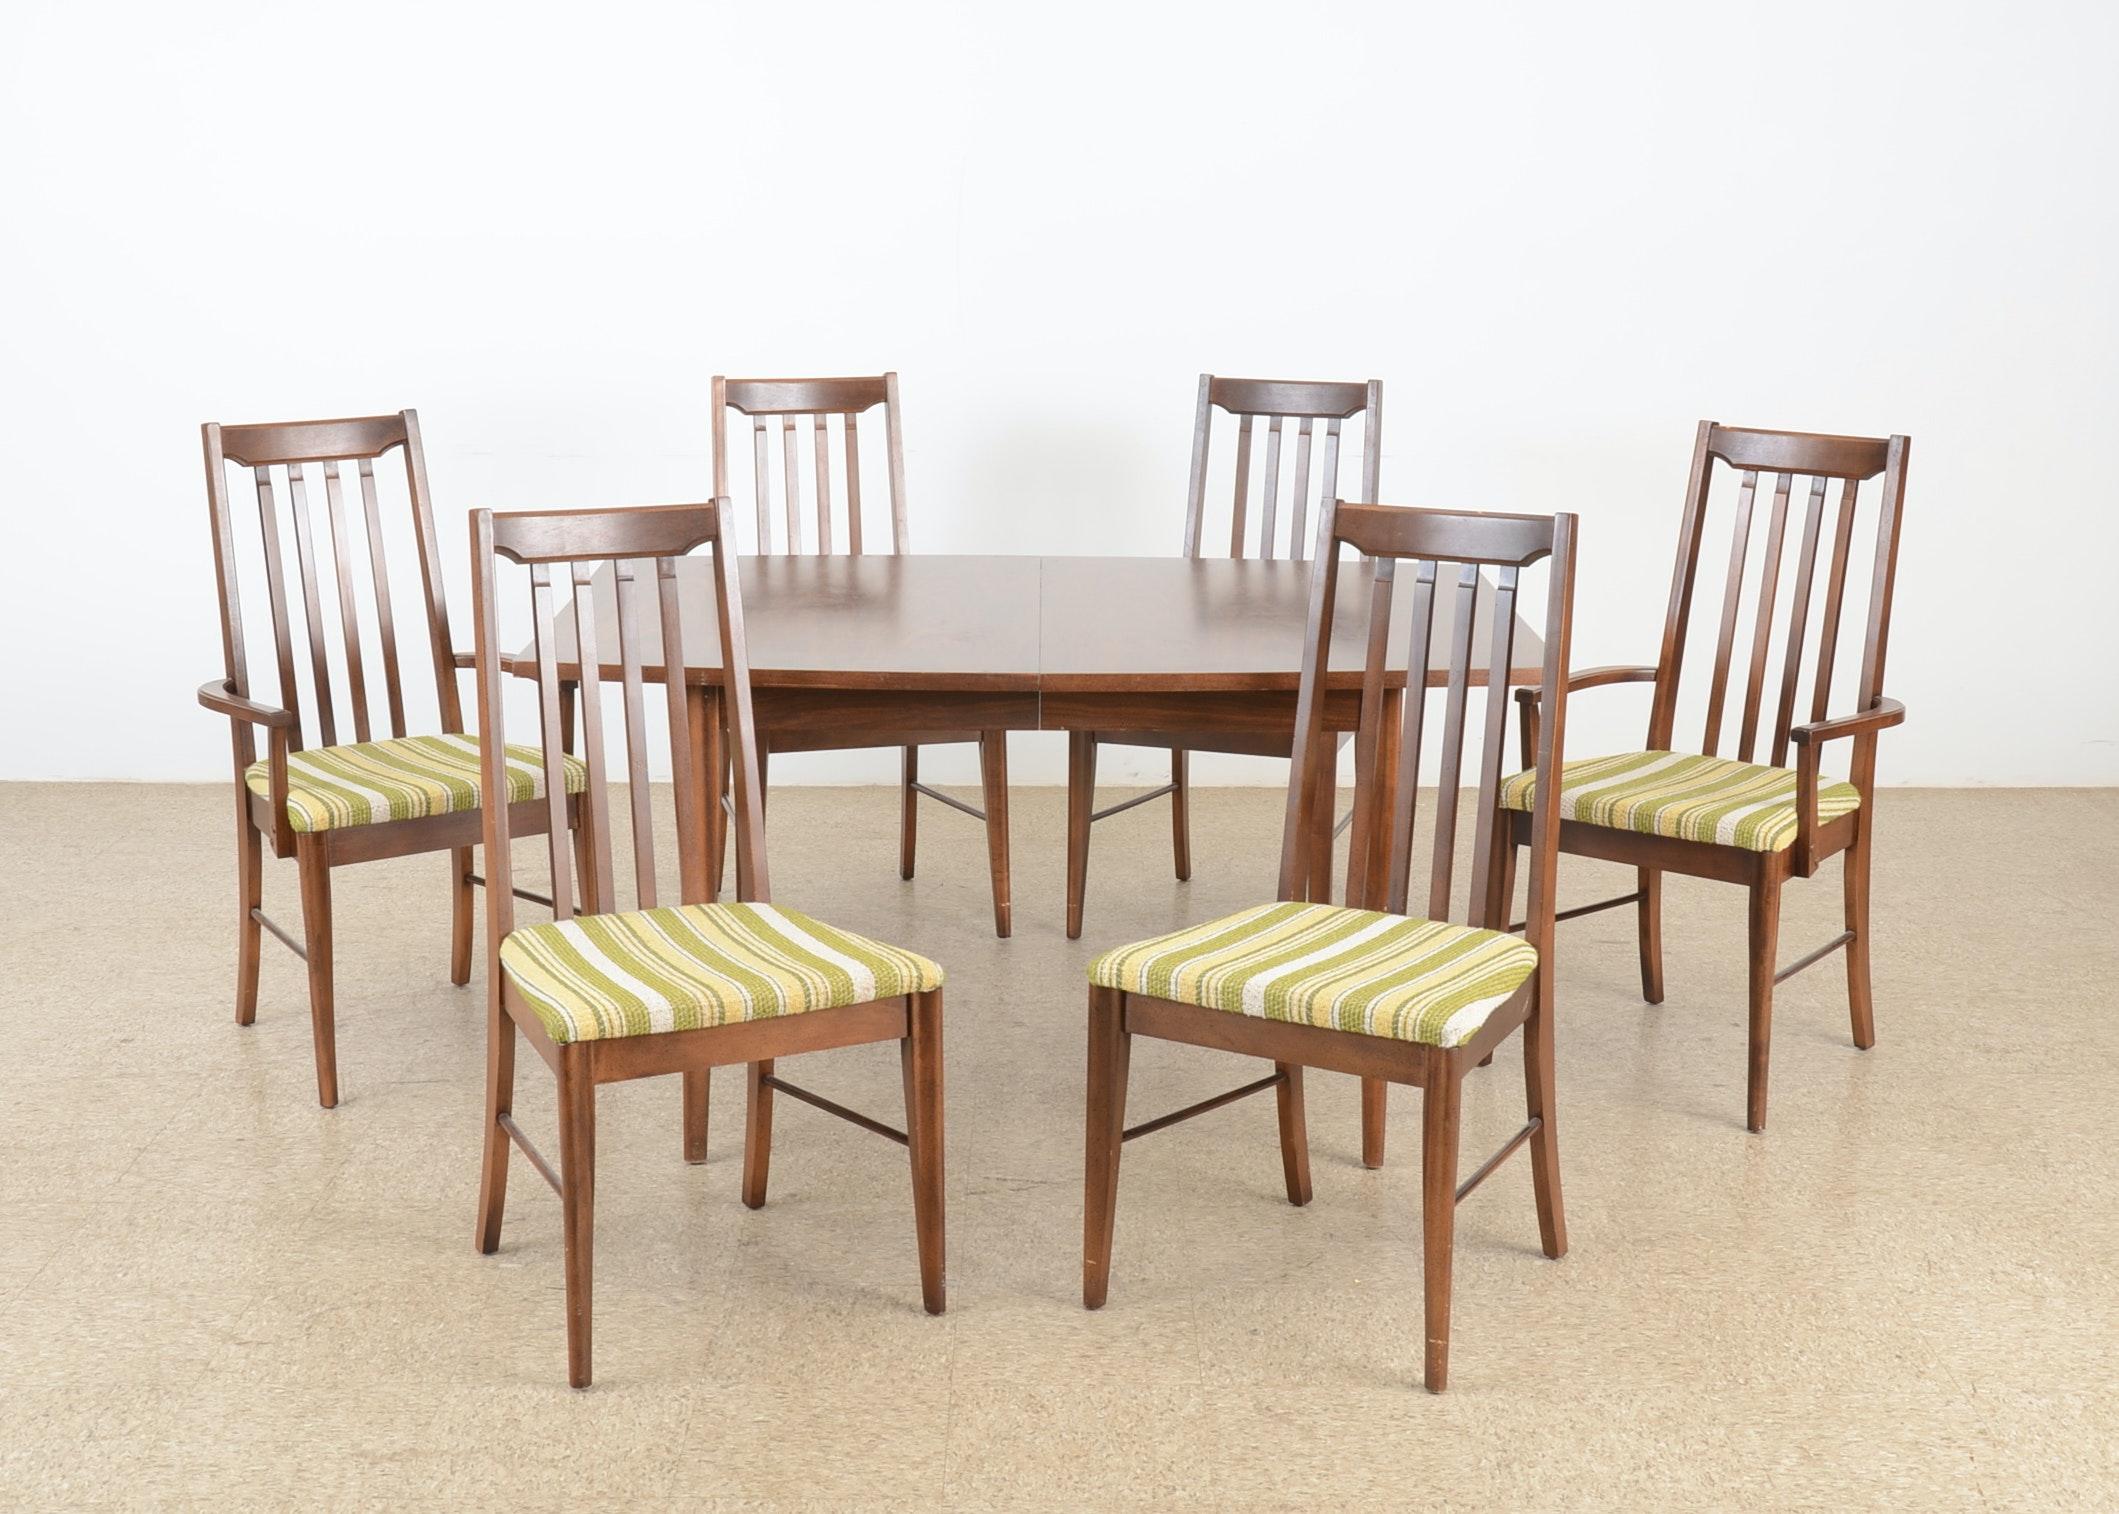 Broyhill Furniture Dining Room Set Circa 1950s Ebth